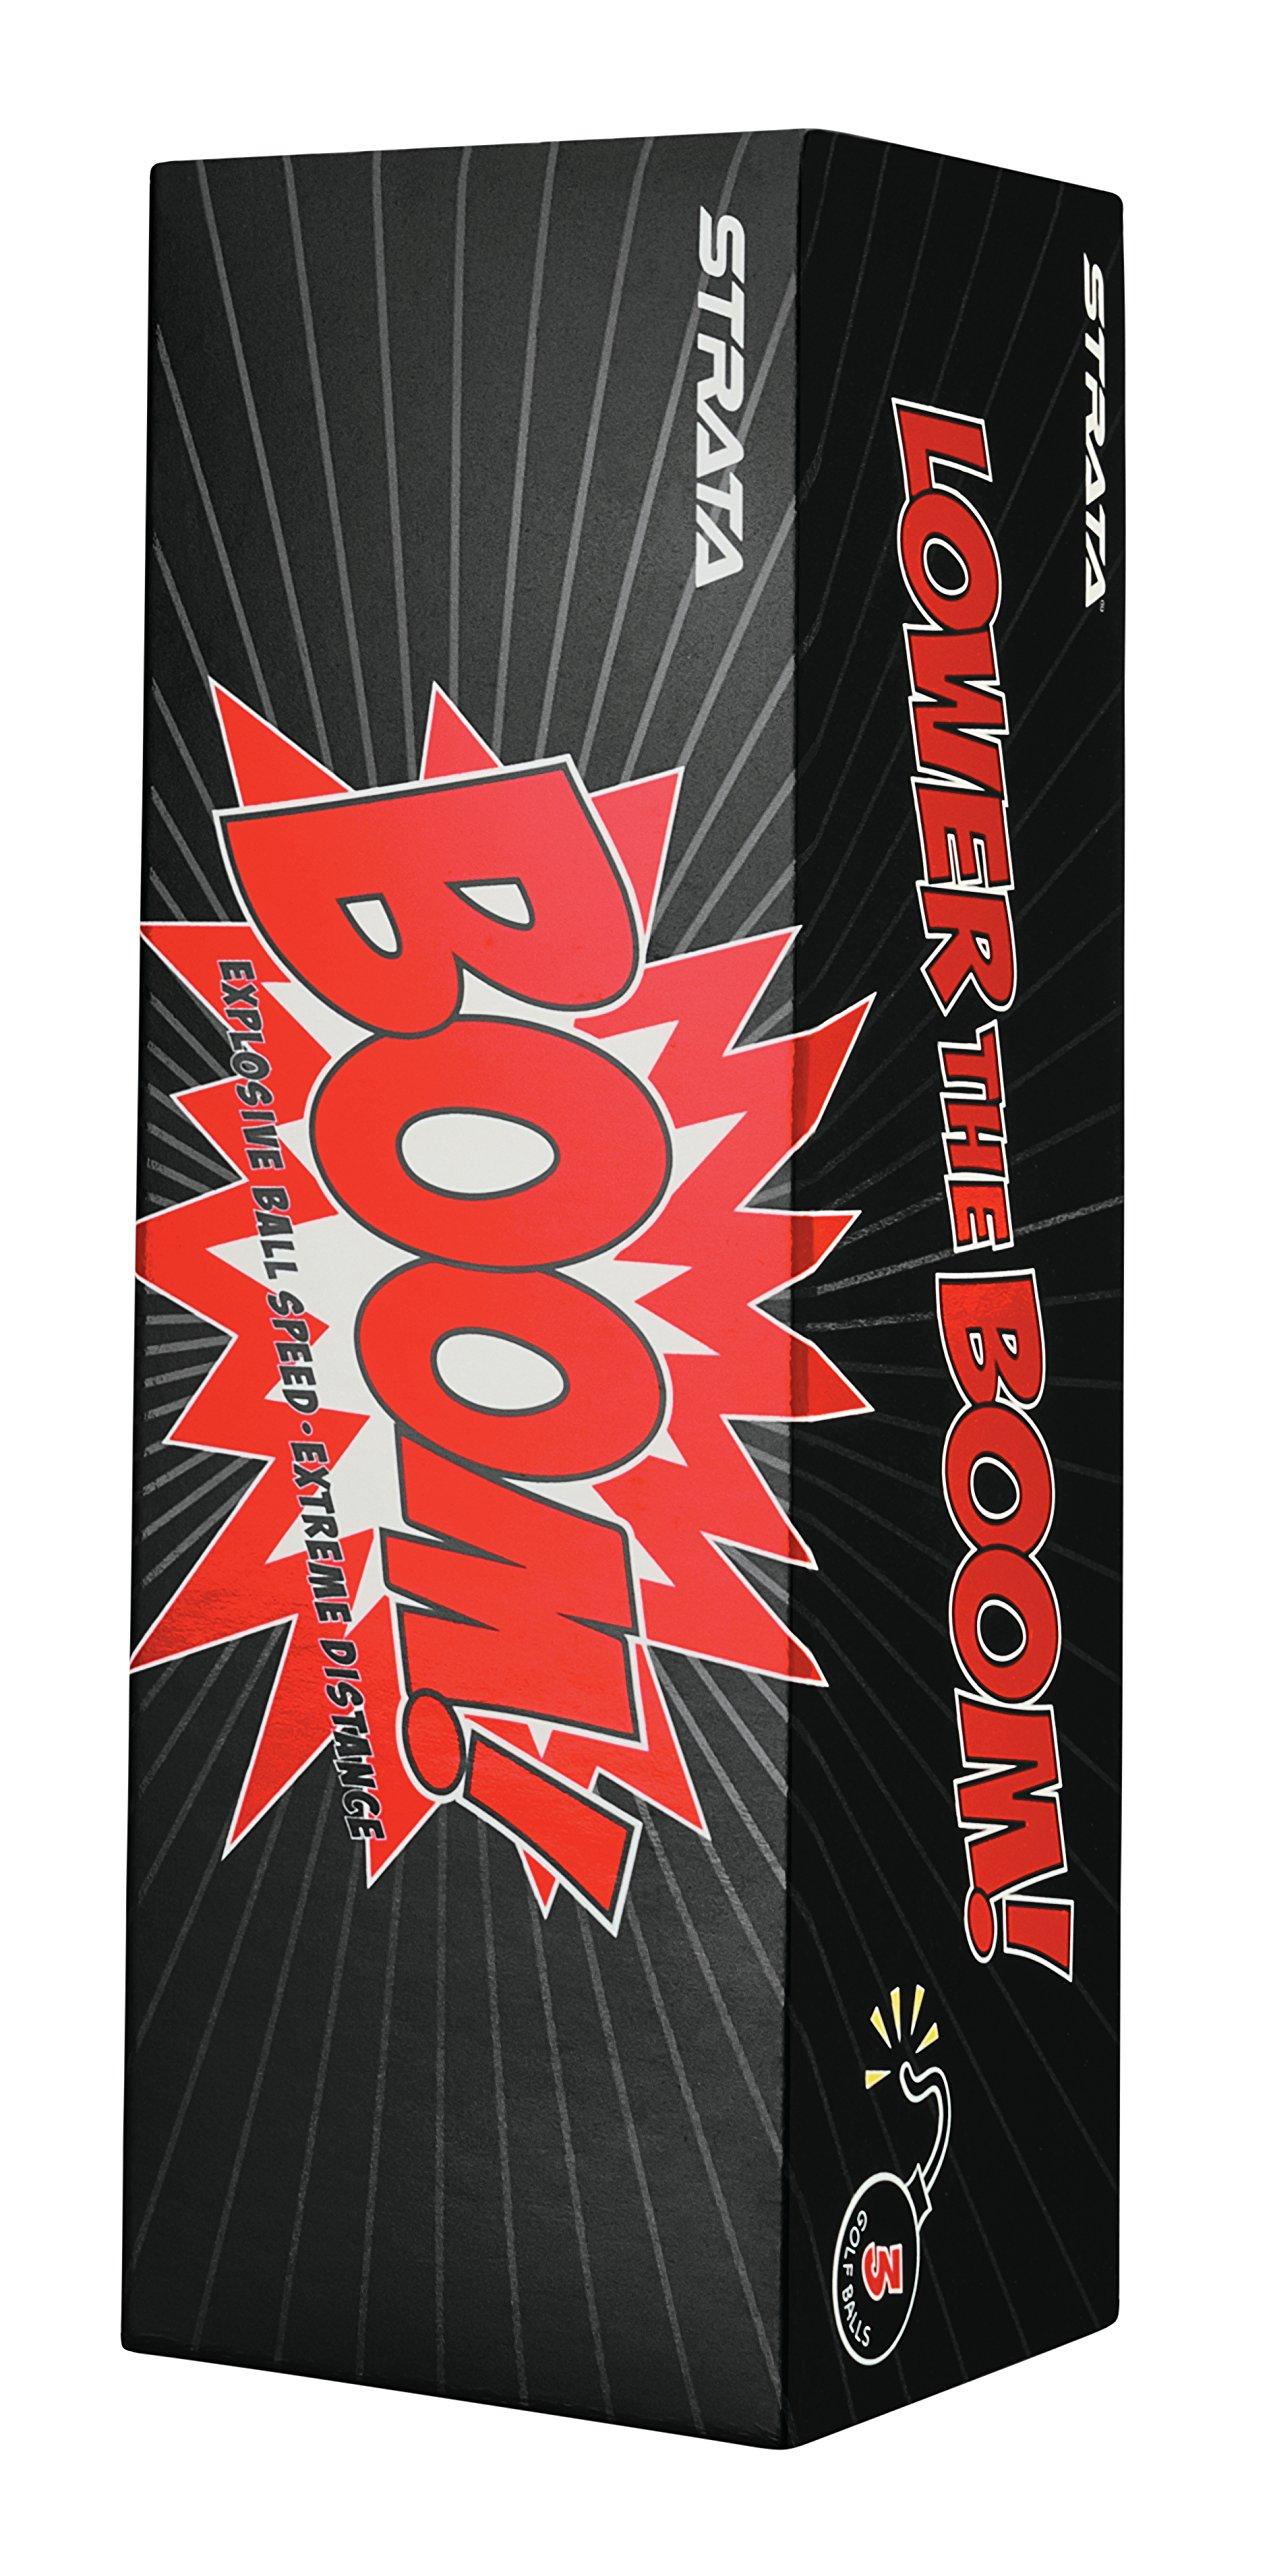 Strata Boom Golf Balls, (Two Dozen), White by Callaway